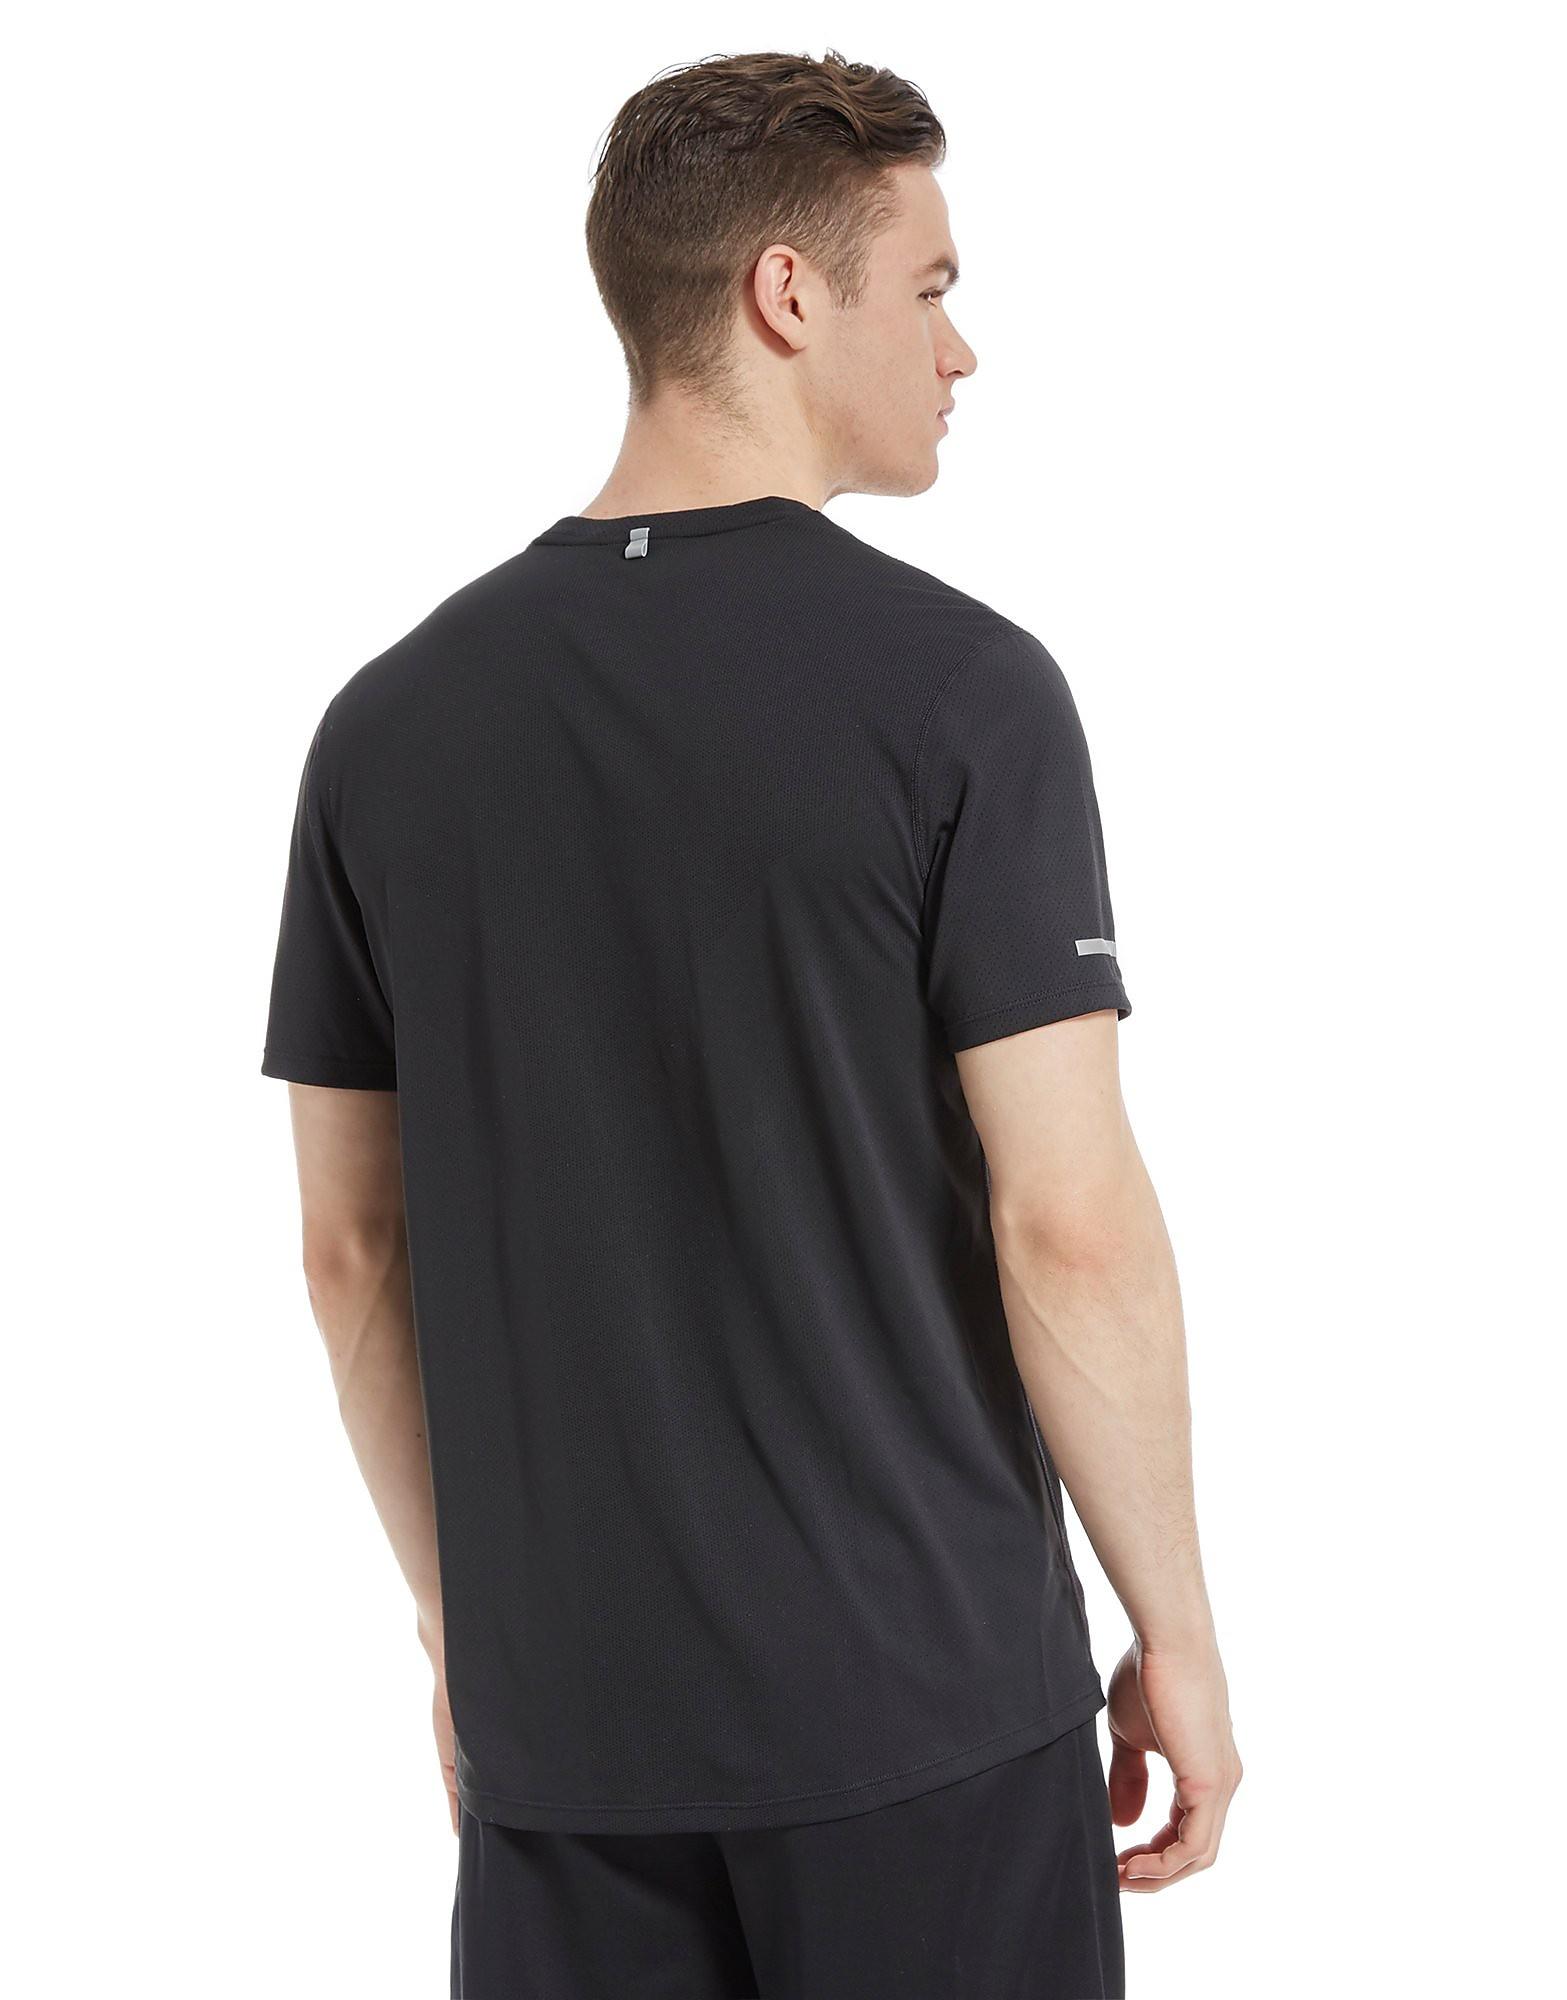 Nike Dri Fit Contour Short Sleeve T-Shirt